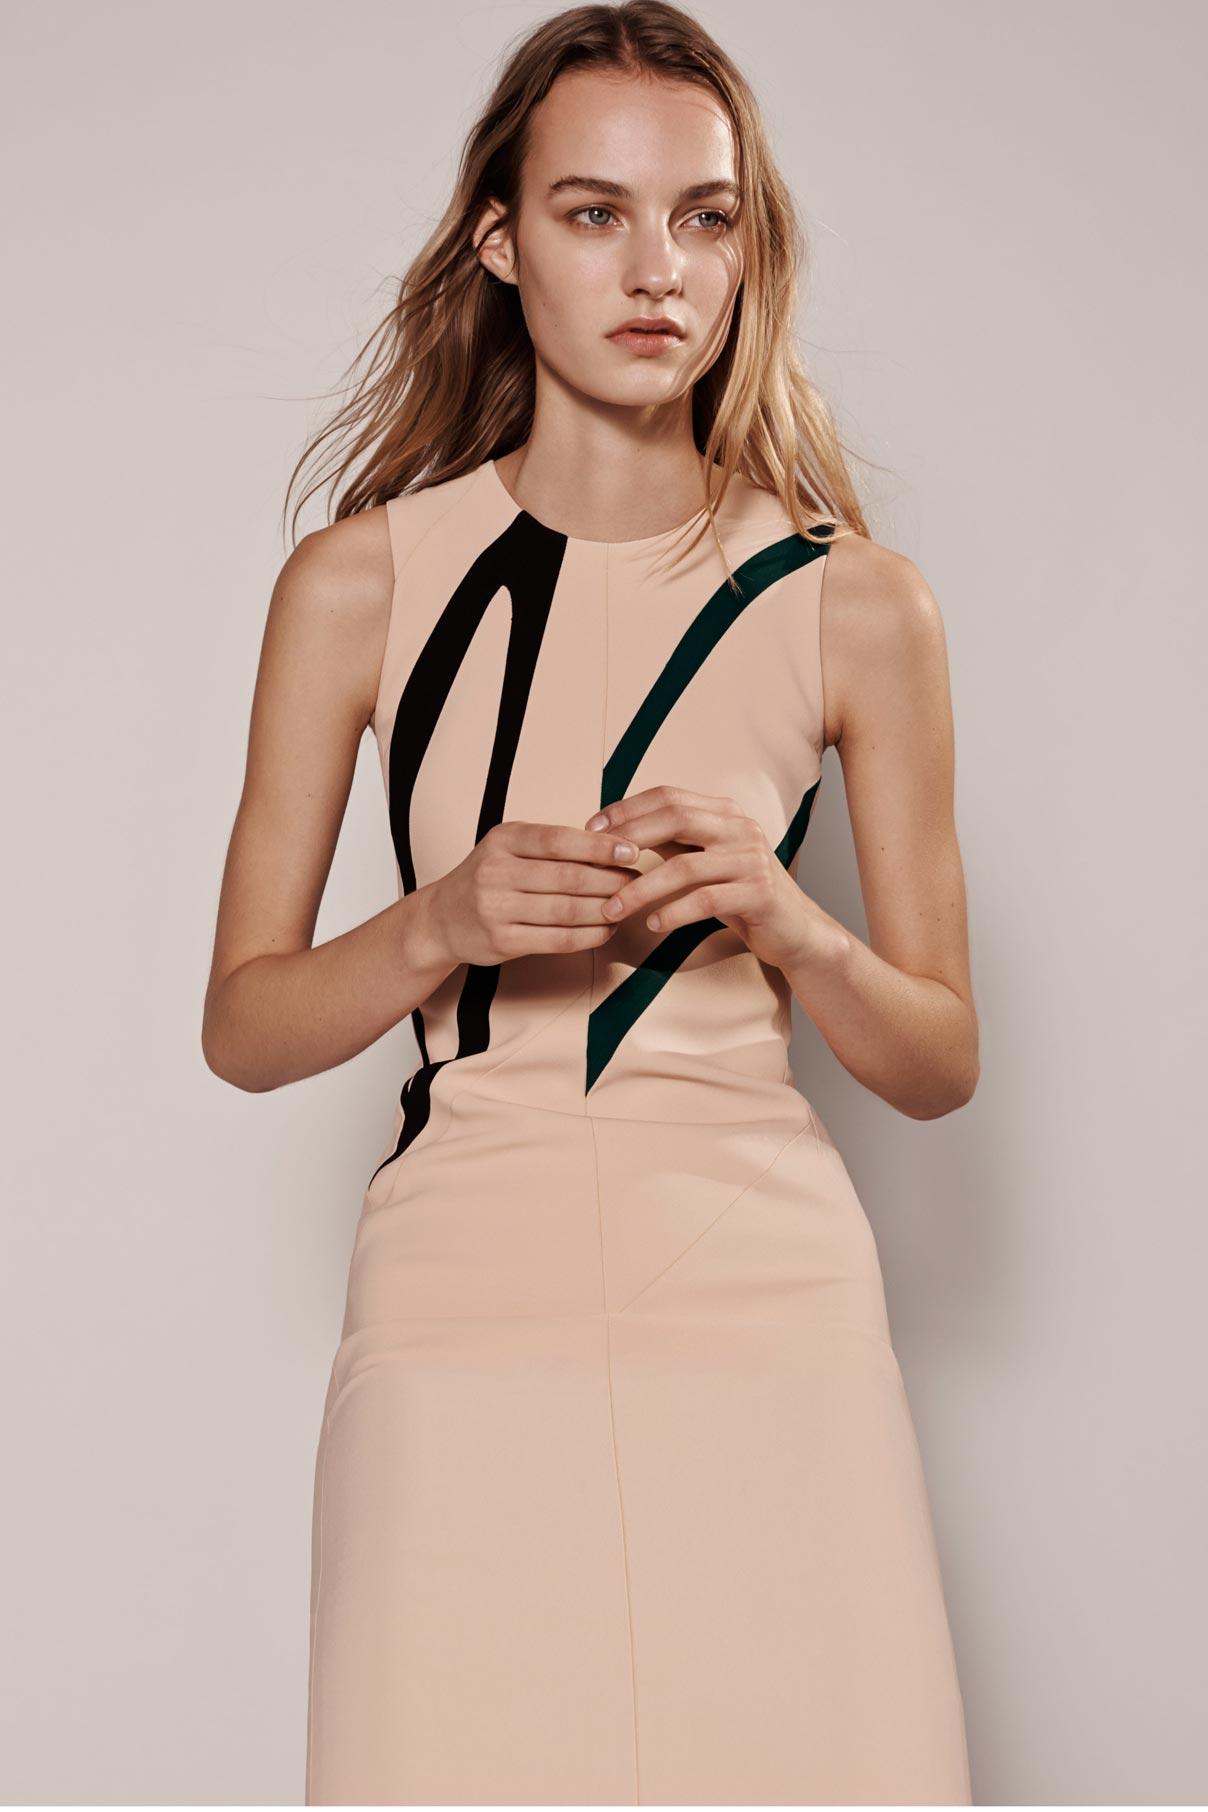 Look 8 Nude/black/dark green viscose crepe graphic dress.